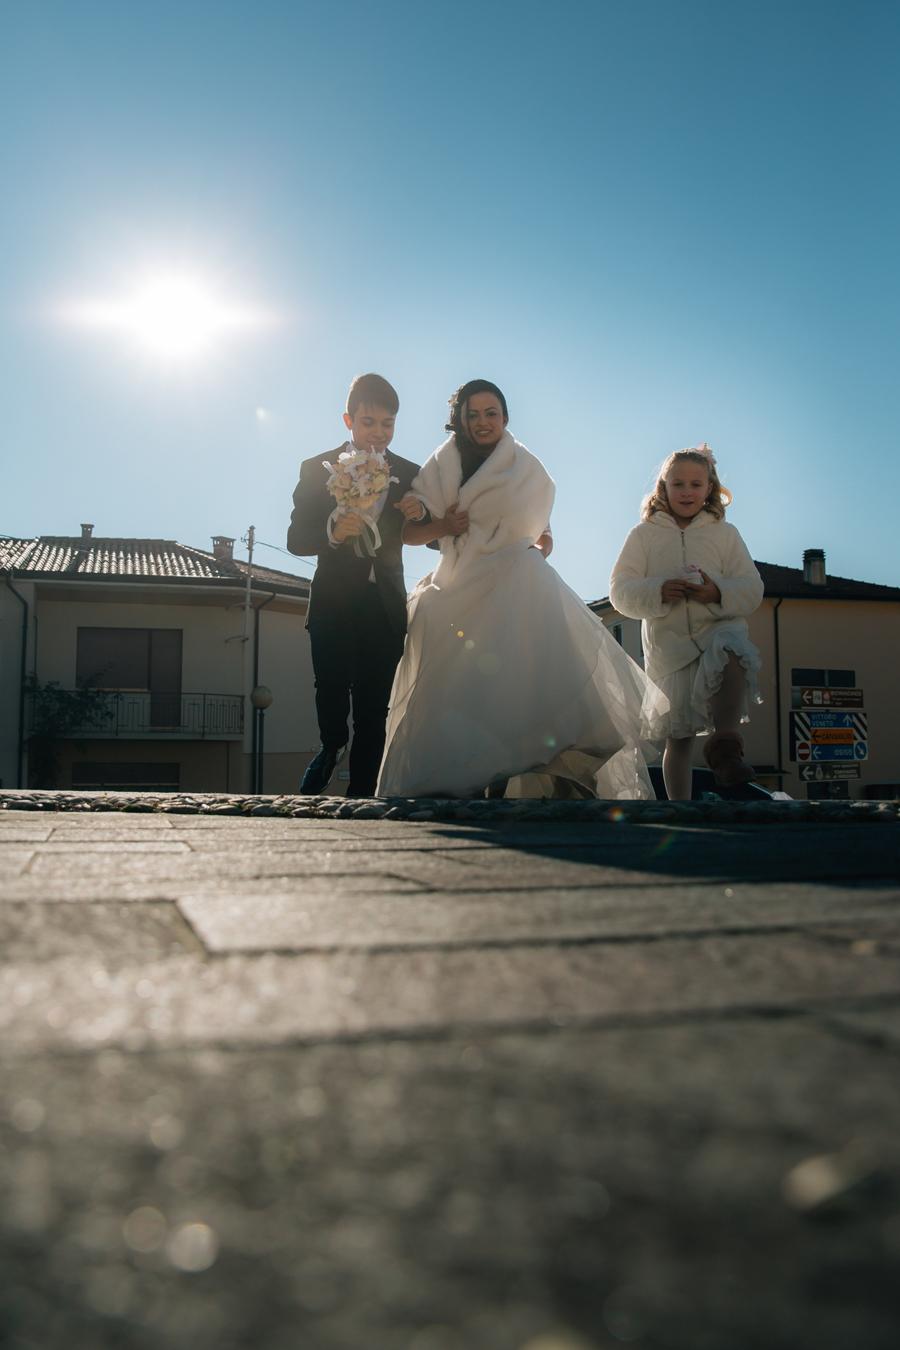 Weddingdestination-Storytelling-Renato-Zanette-Fotografo-Fregona-Treviso-Veneto-Il-Momento-è-Arrivato